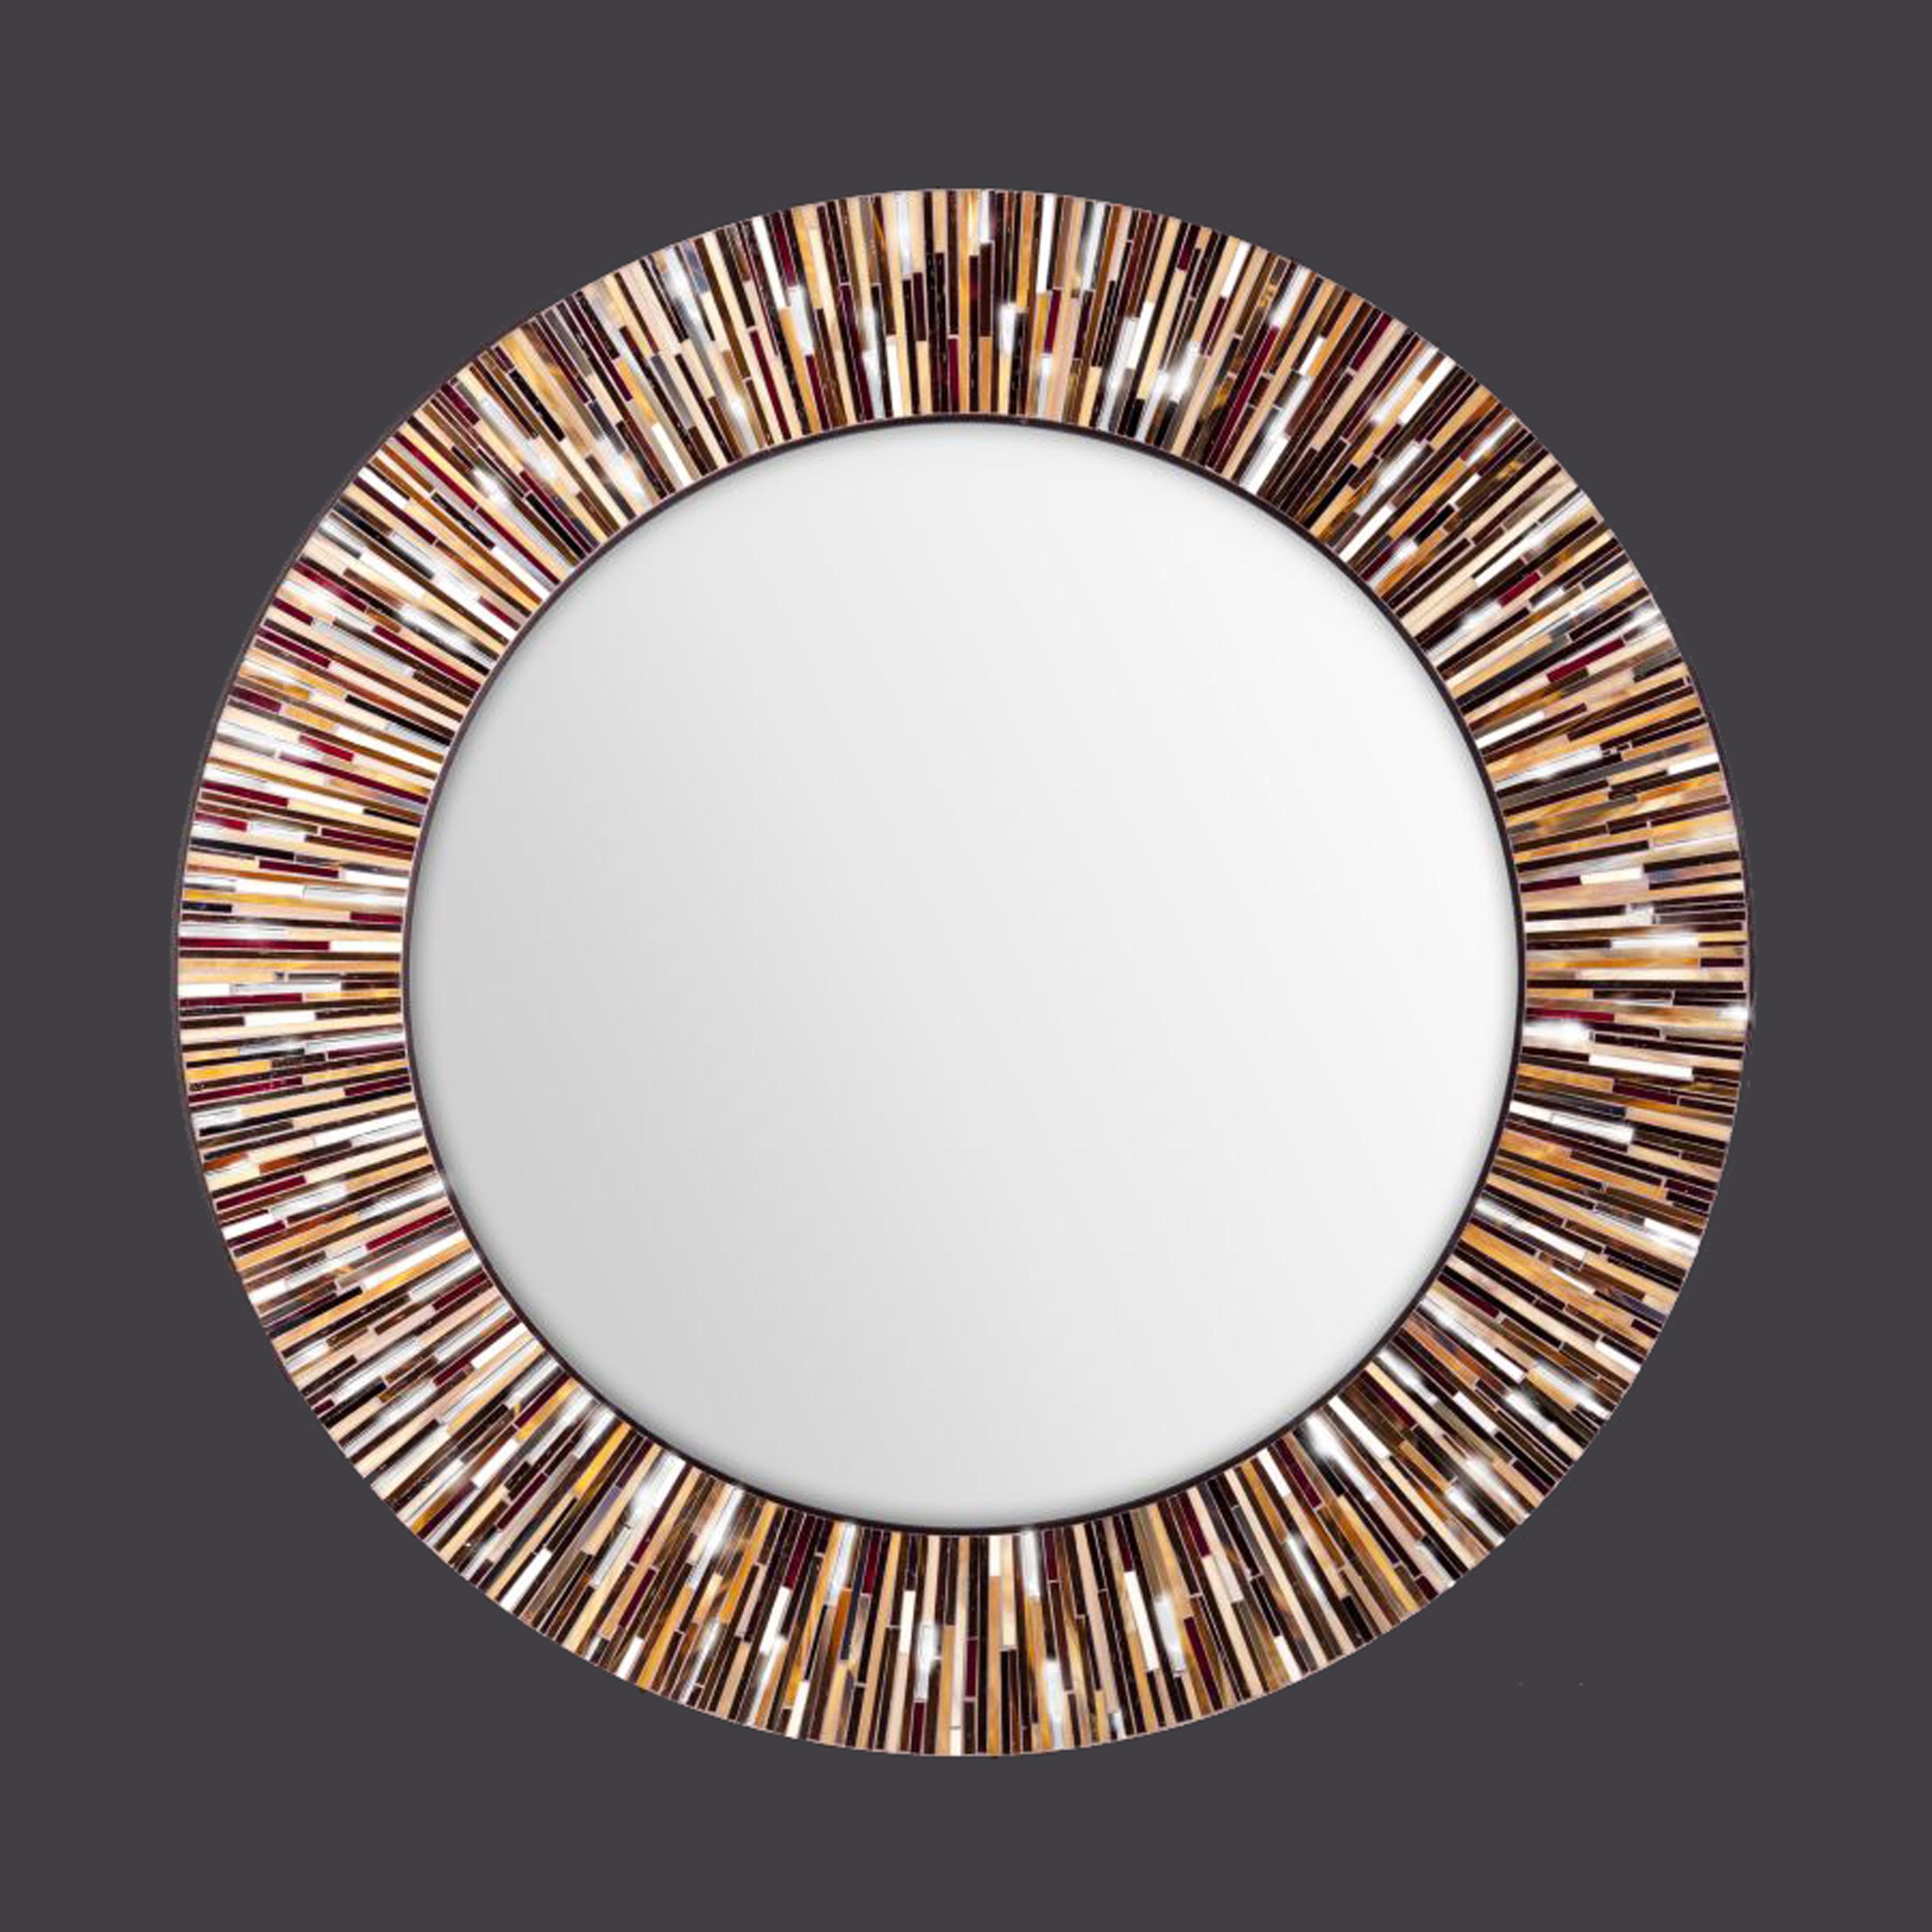 Mosaic Wall Mirrors Piaggi Inside Large Mosaic Mirrors (Image 12 of 15)